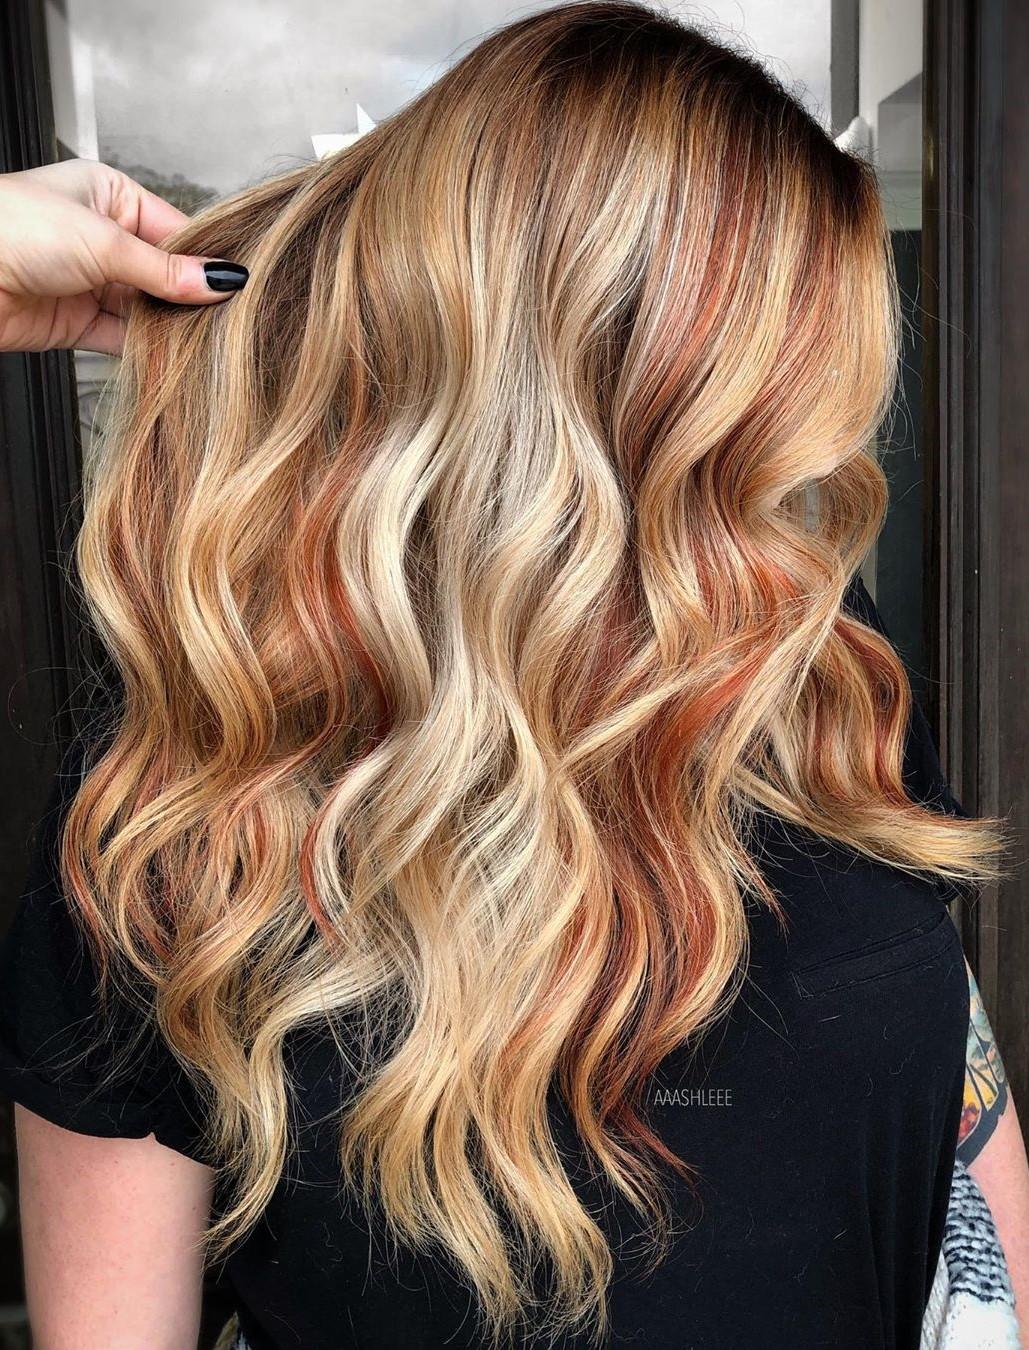 Red Highlights for Caramel Blonde Hair